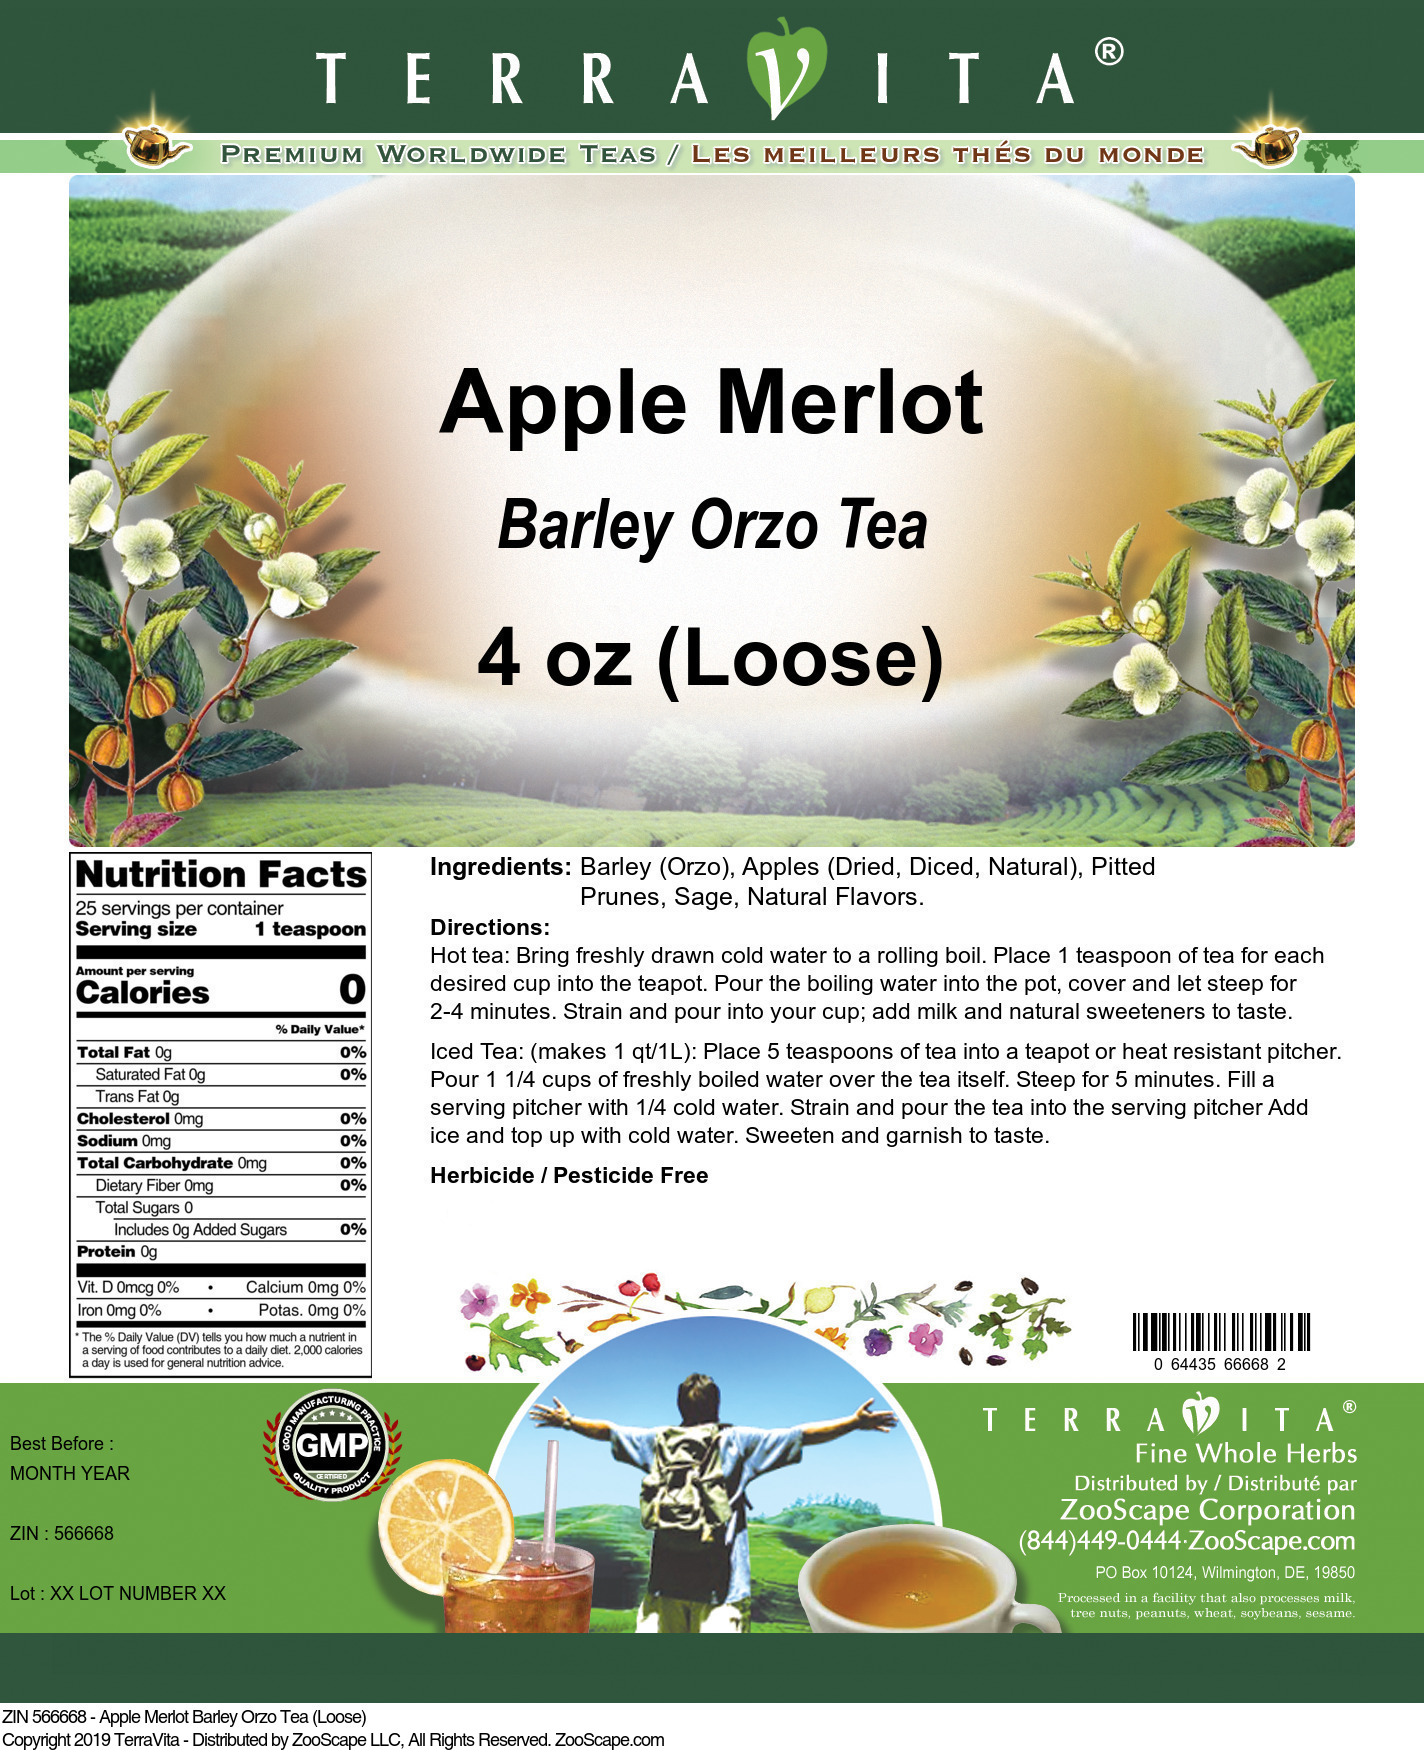 Apple Merlot Barley Orzo Tea (Loose)